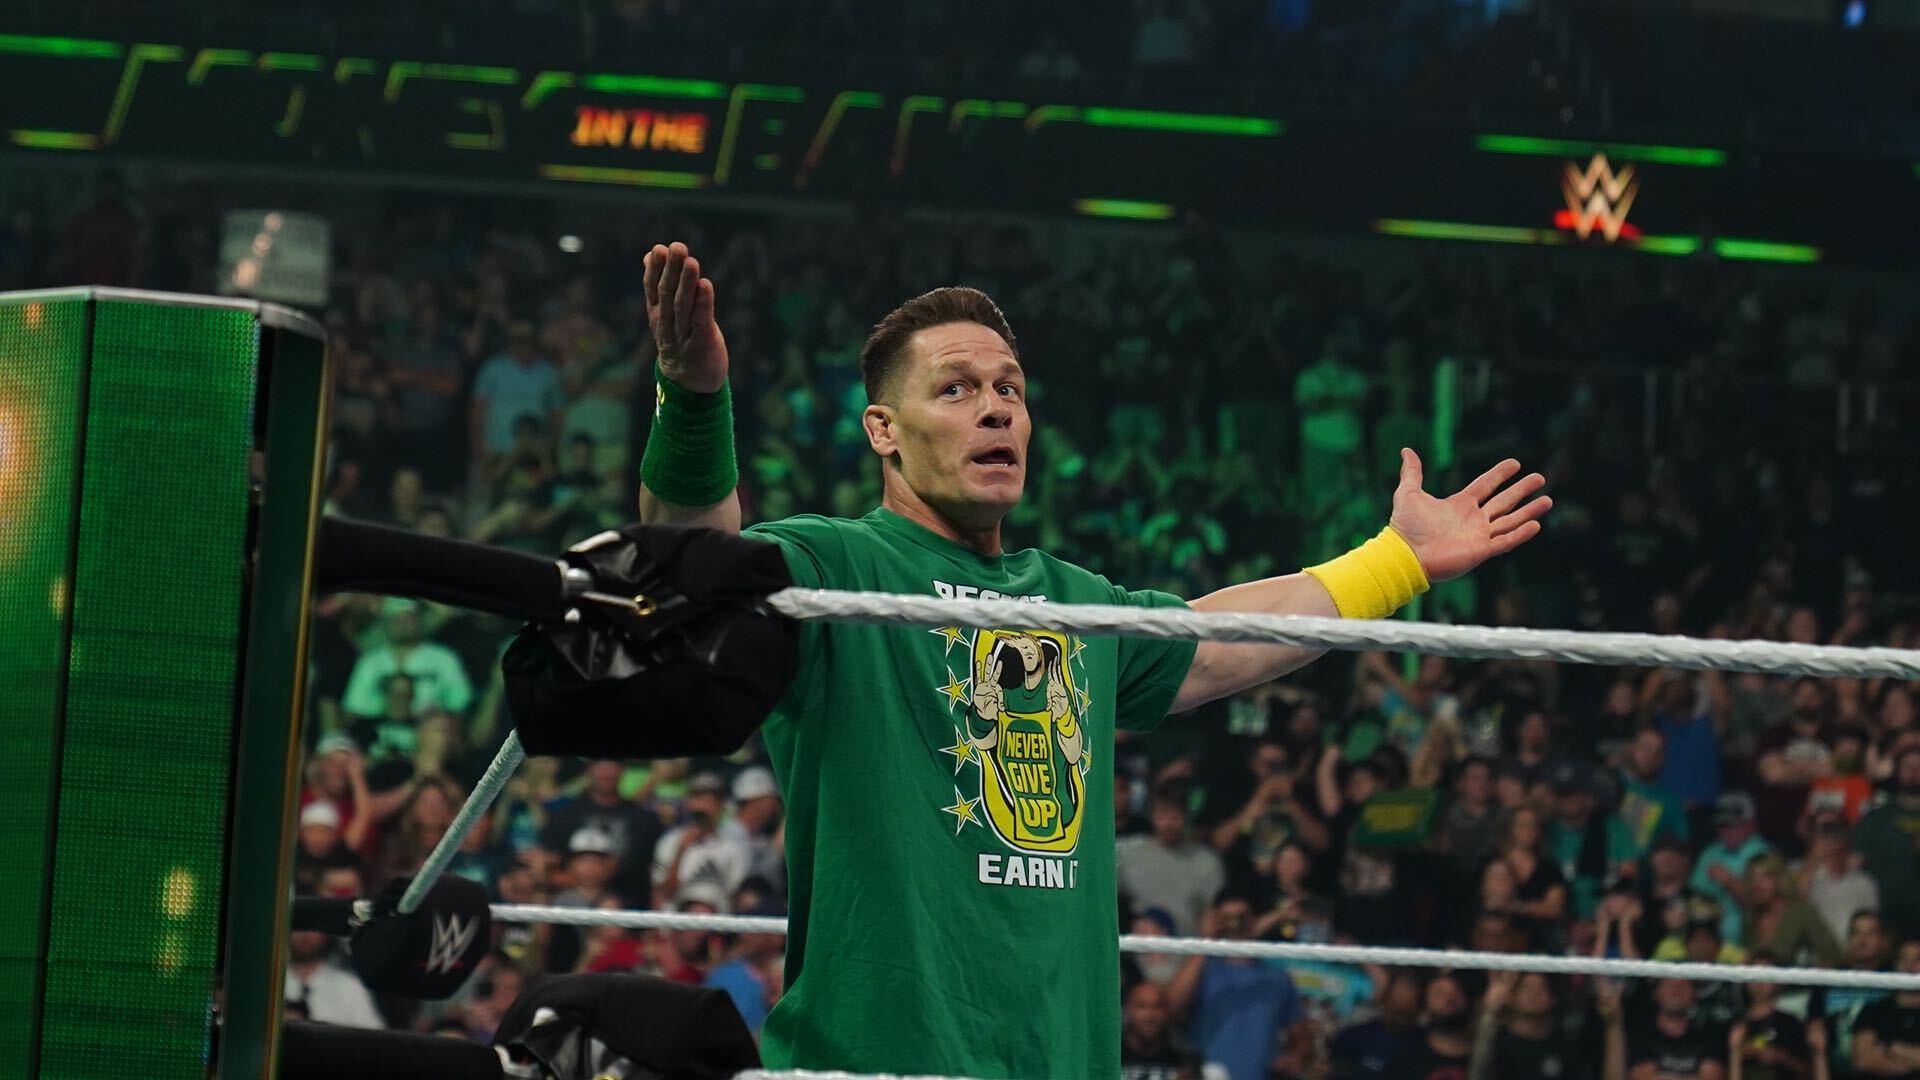 John Cena - Money in the Bank 2021